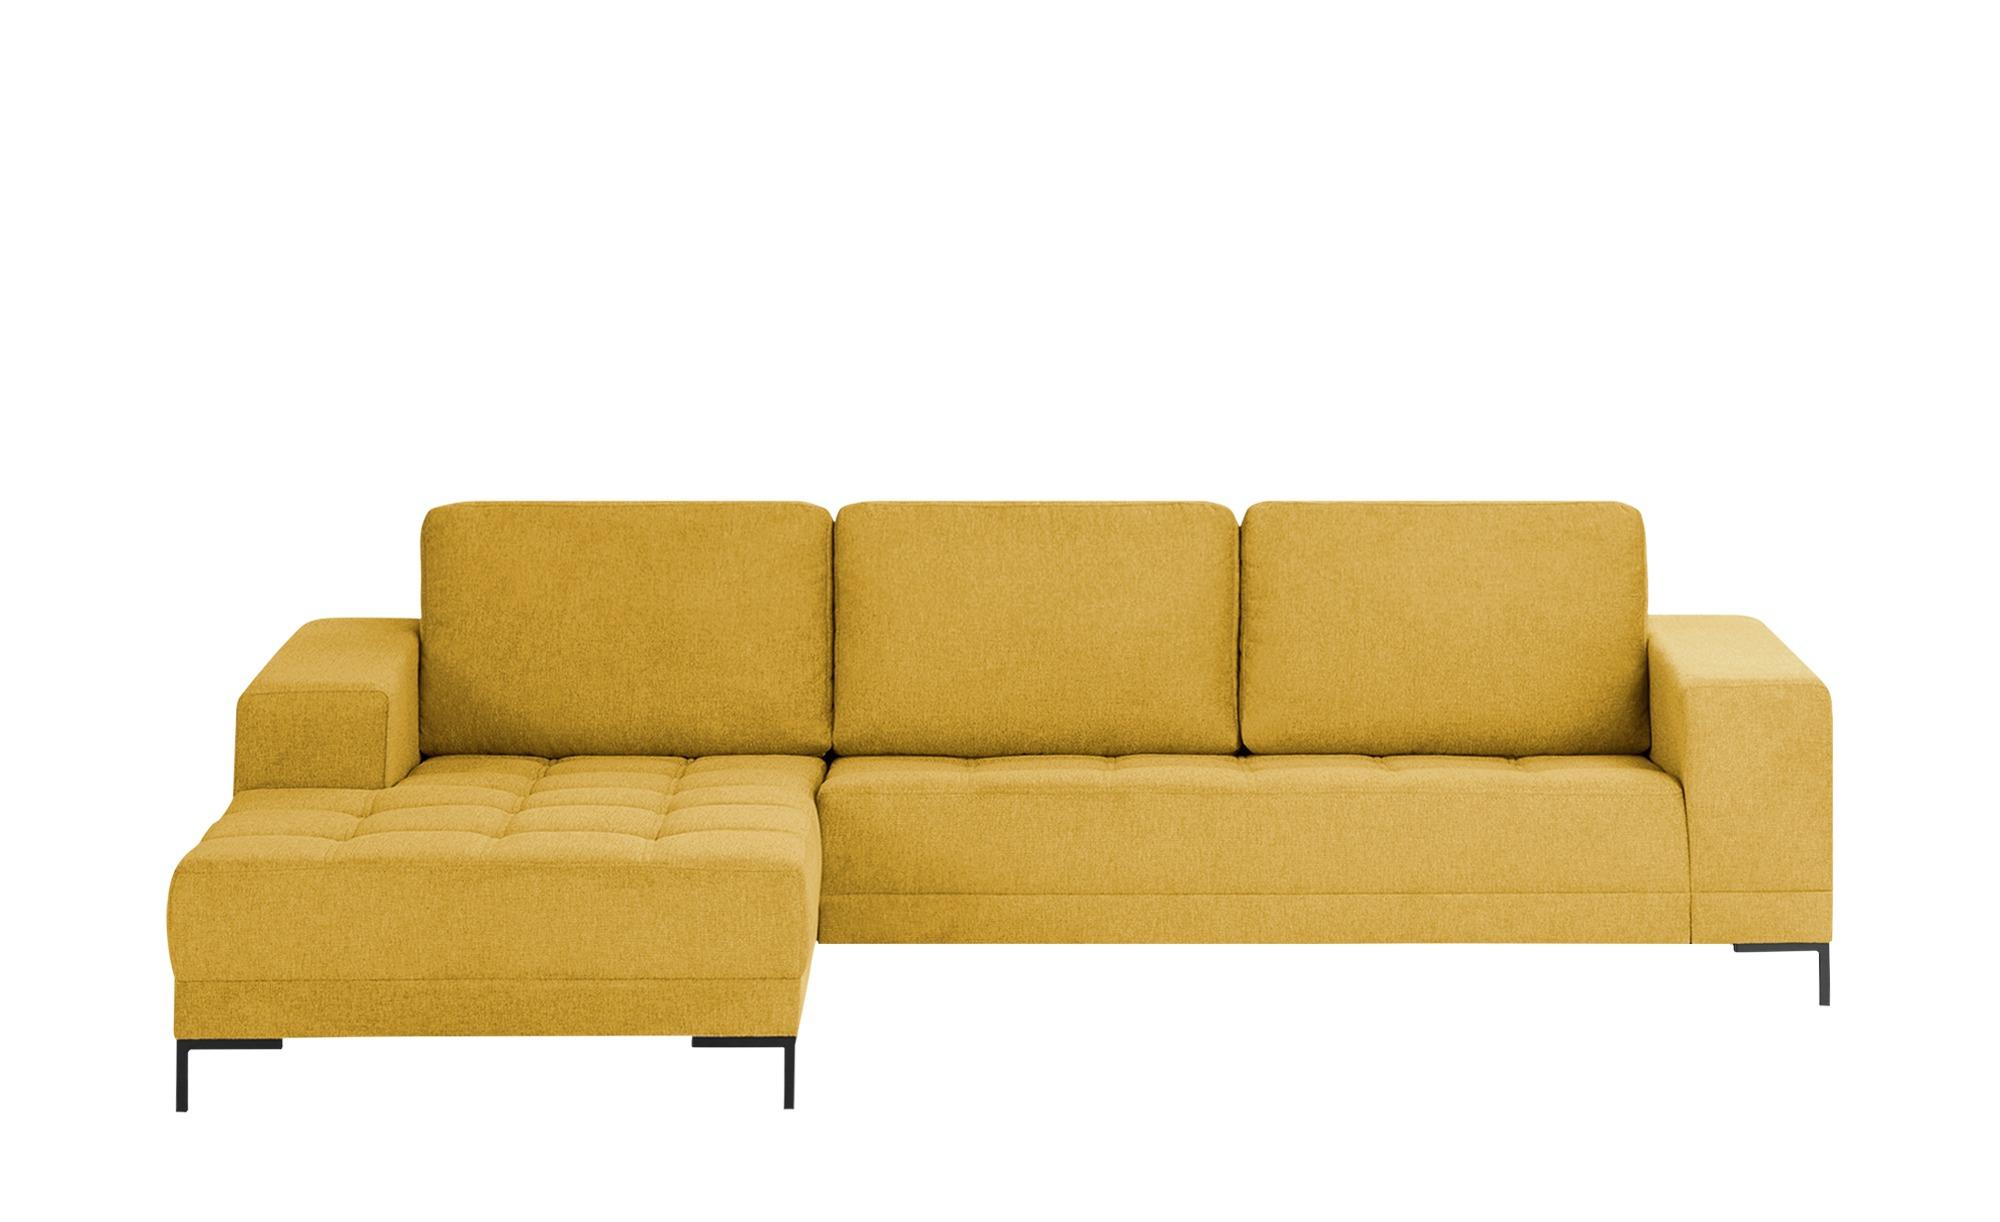 smart Ecksofa  Garda ¦ gelb ¦ Maße (cm): H: 81 Polstermöbel > Sofas > Ecksofas - Höffner